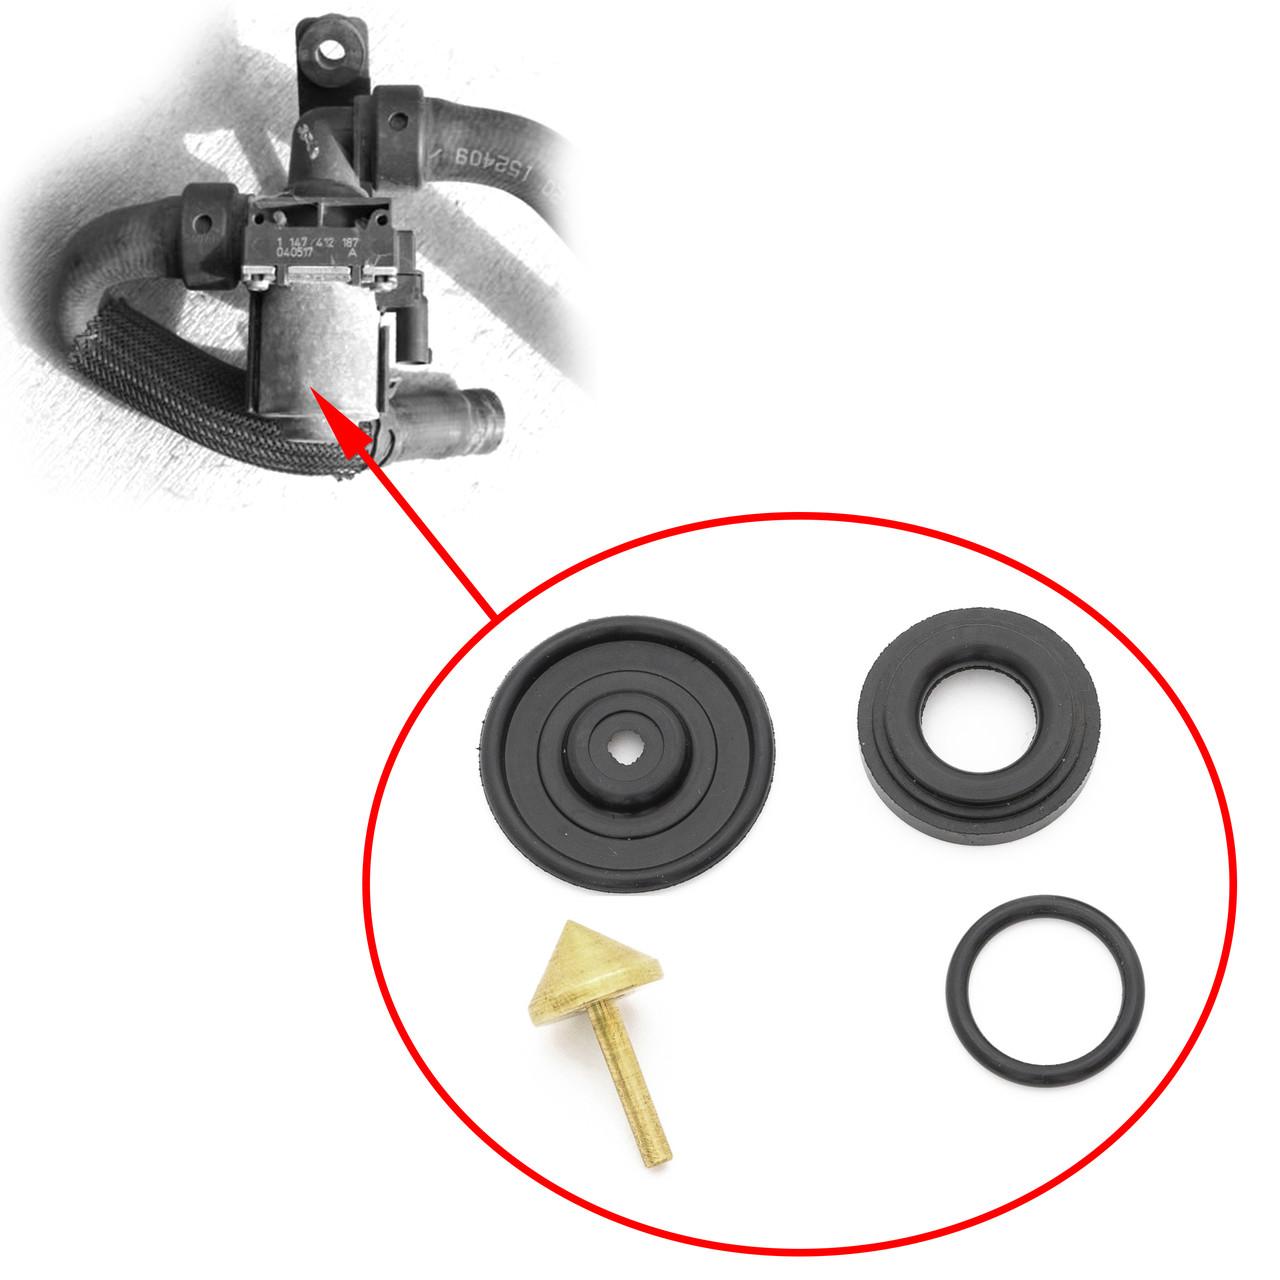 Ремкомплект клапанов печки Infiniti QX56, Nissan Armada, Volvo FH